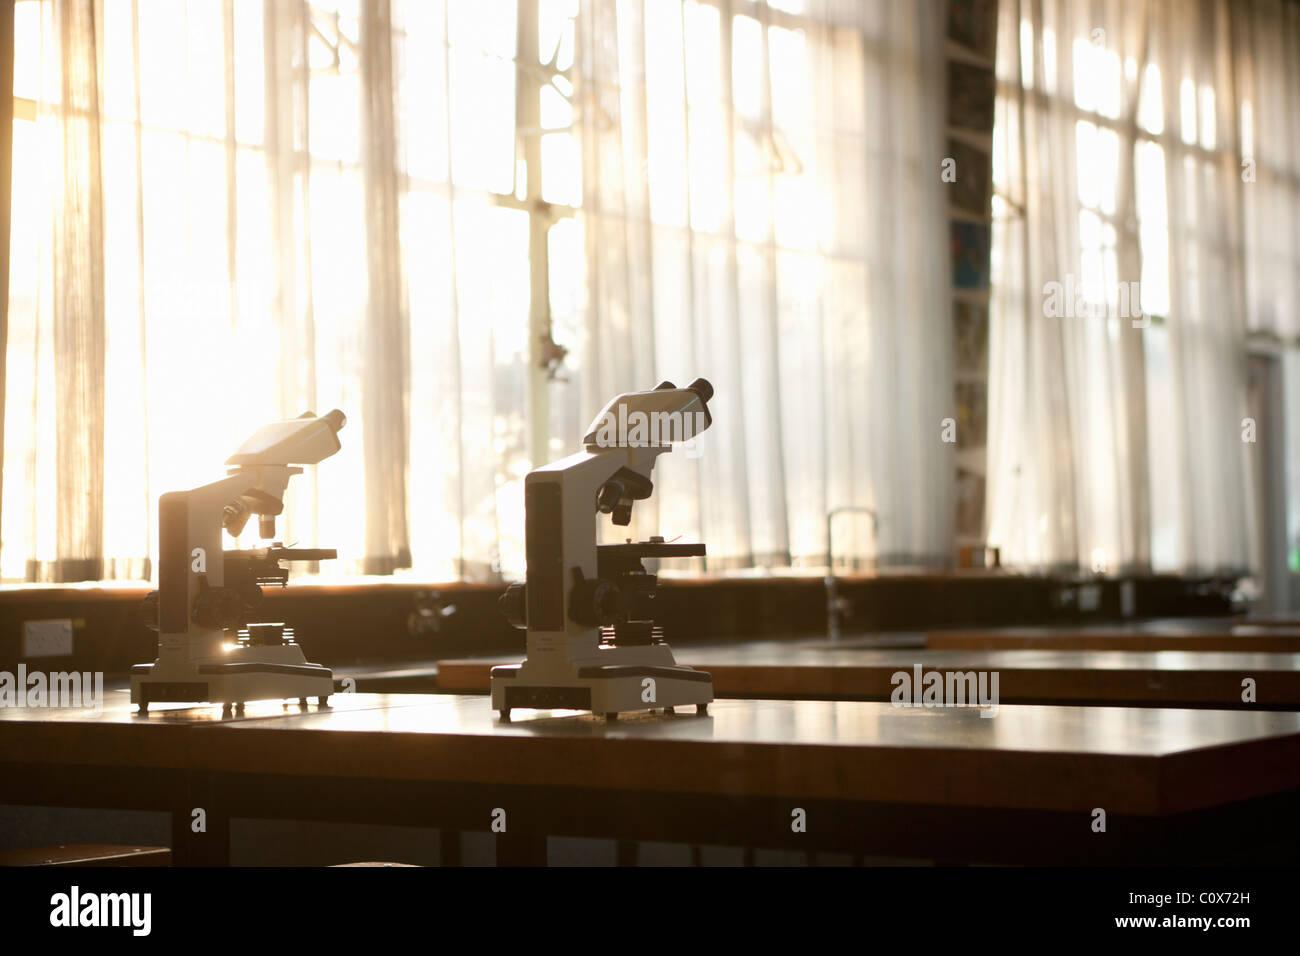 Zwei Micrpscopes auf Bank Stockbild